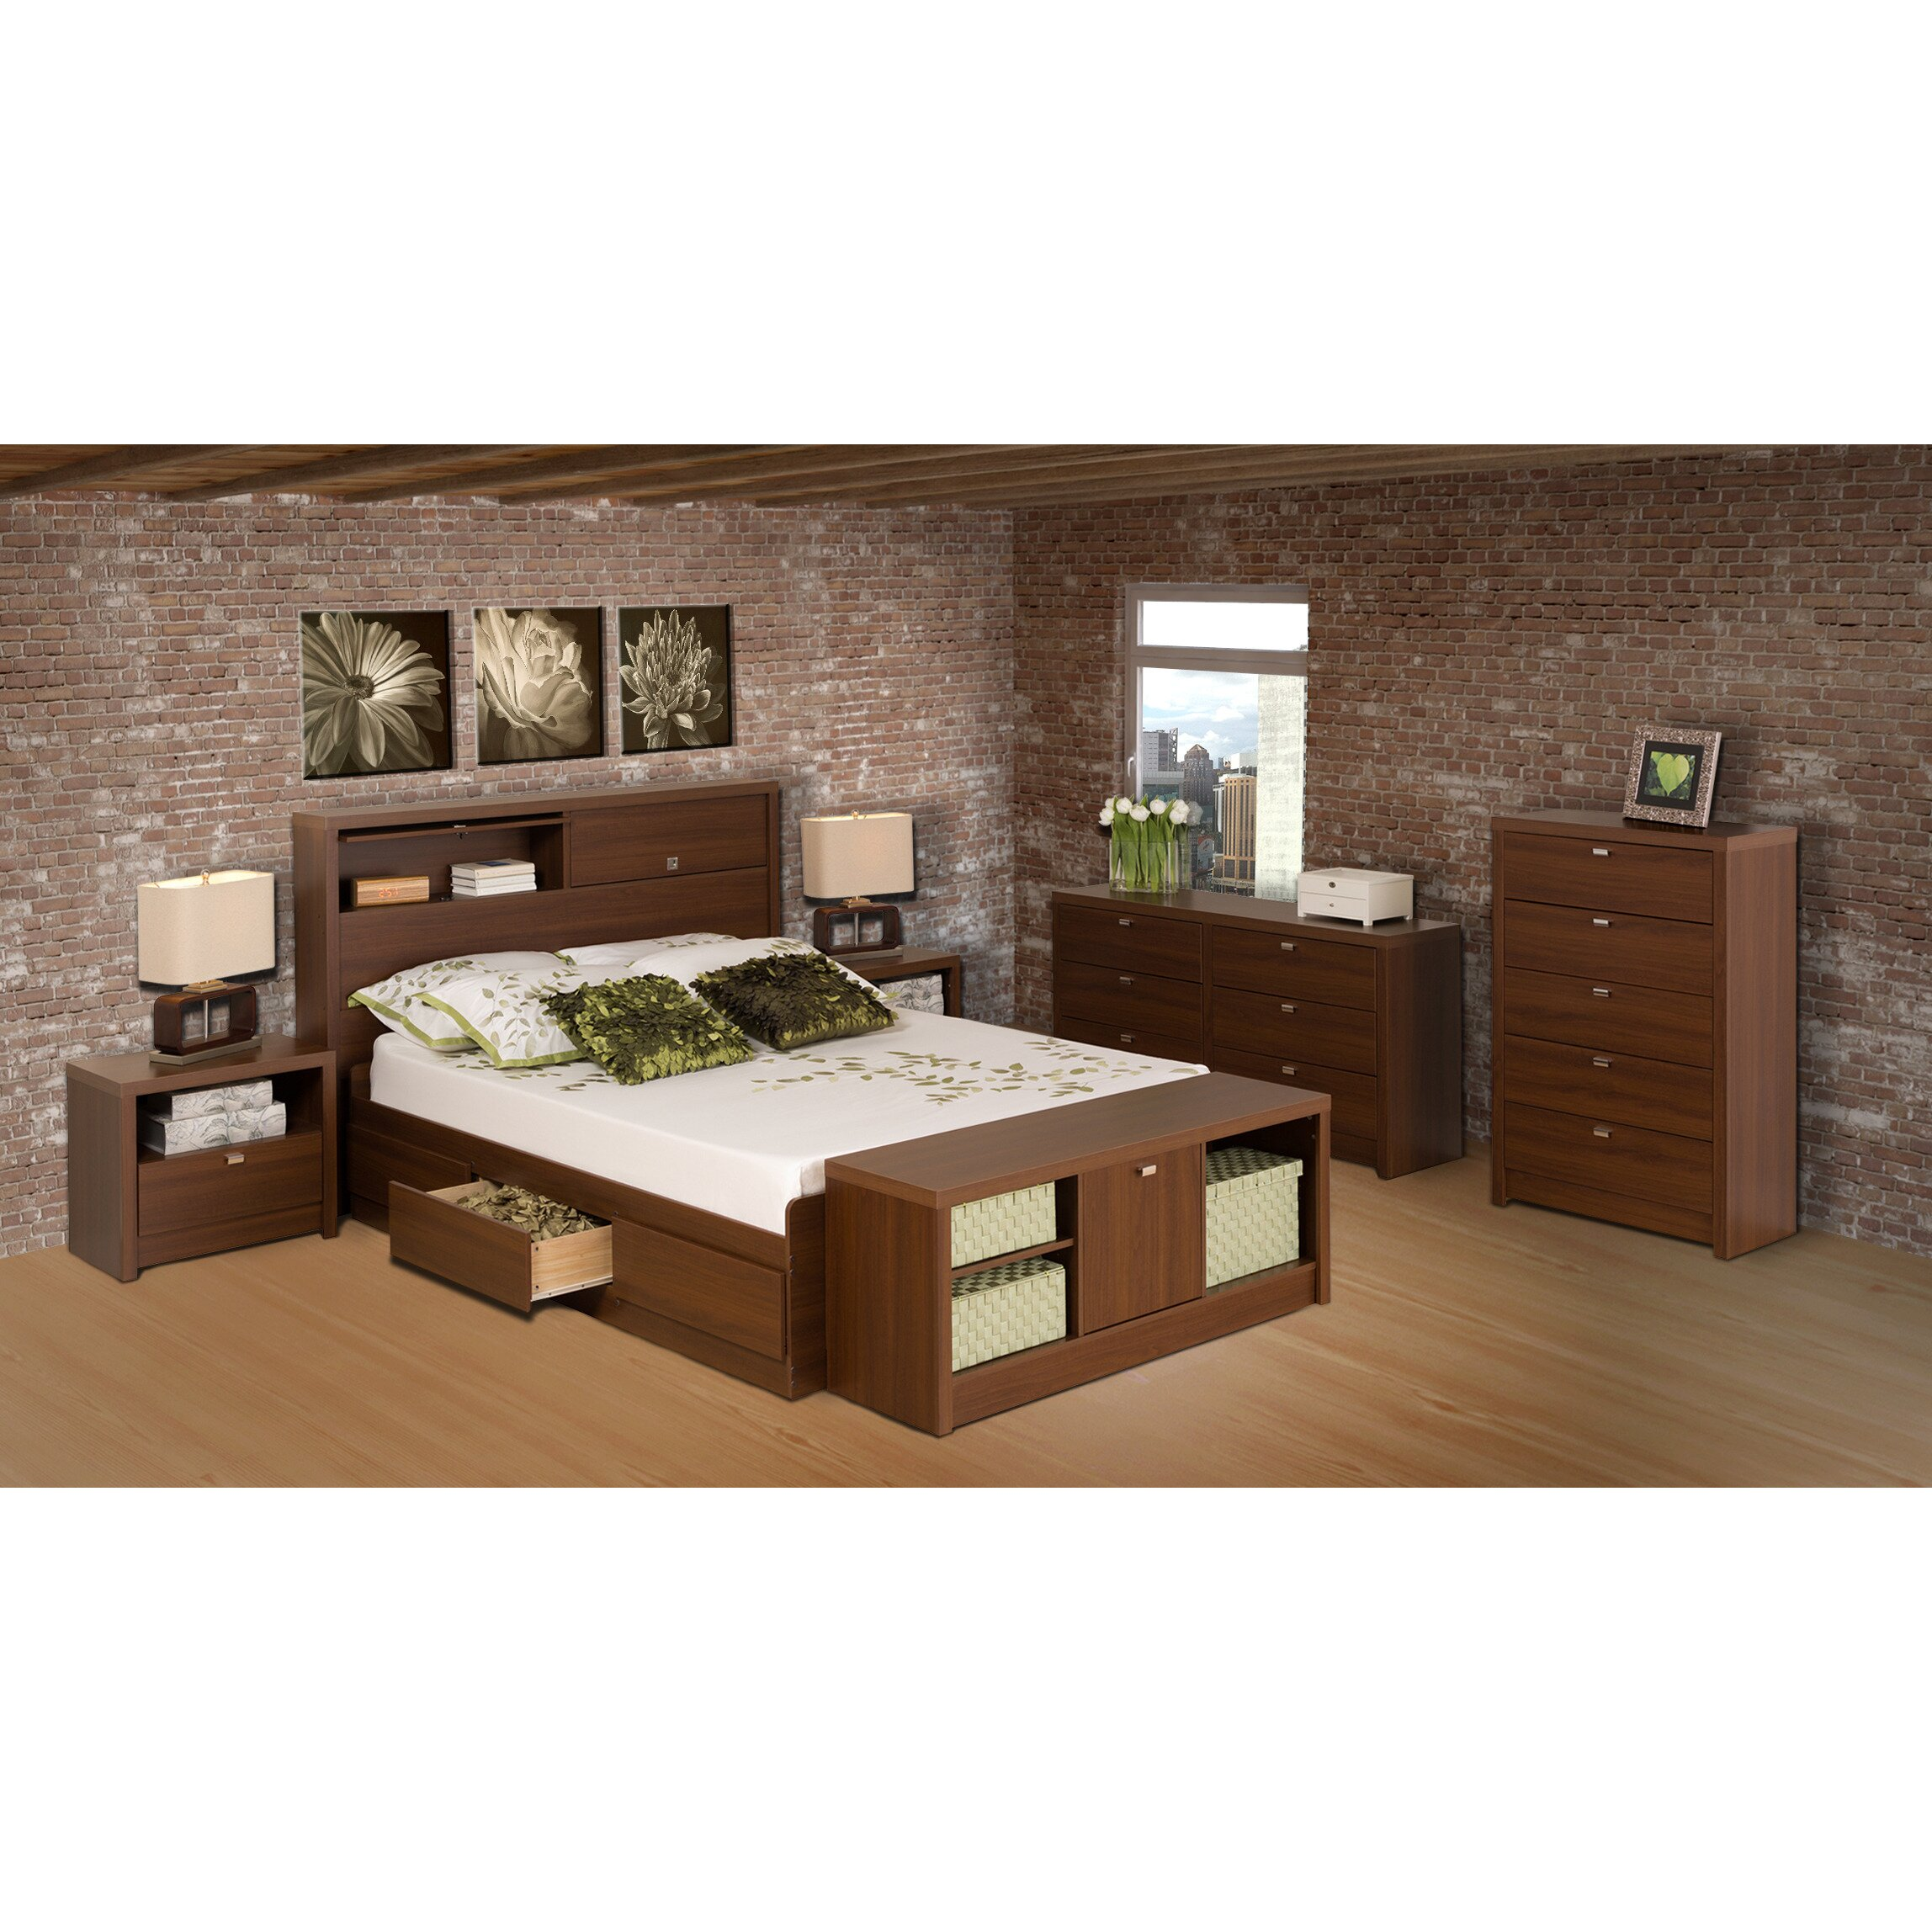 prepac bedroom cubbie storage bench reviews wayfair. Black Bedroom Furniture Sets. Home Design Ideas